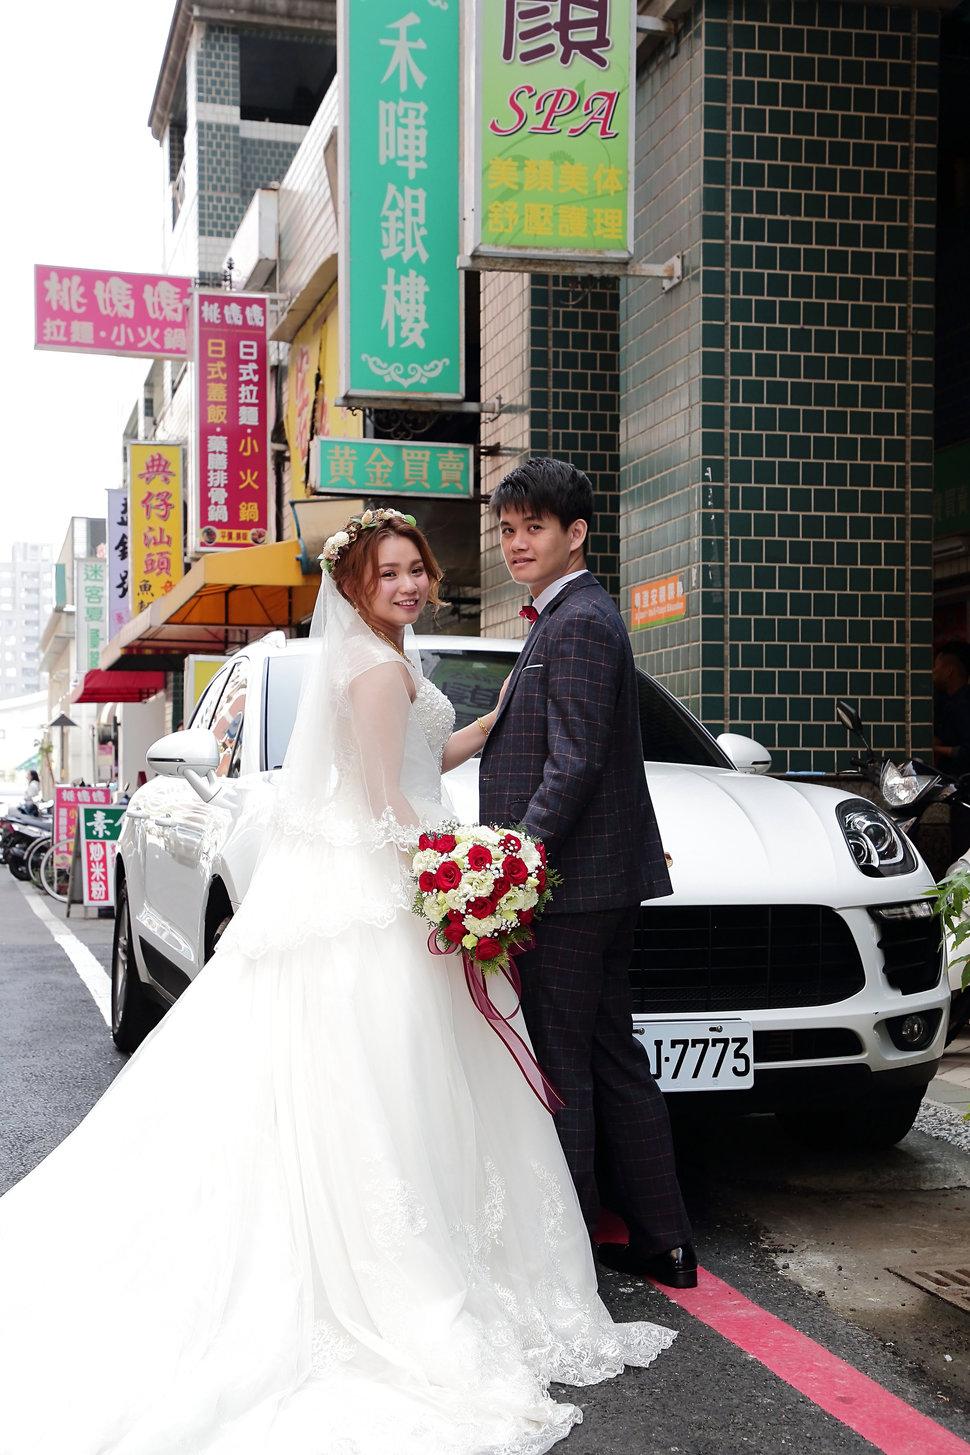 201902230219 - Loveliness ♥ wedding - 結婚吧